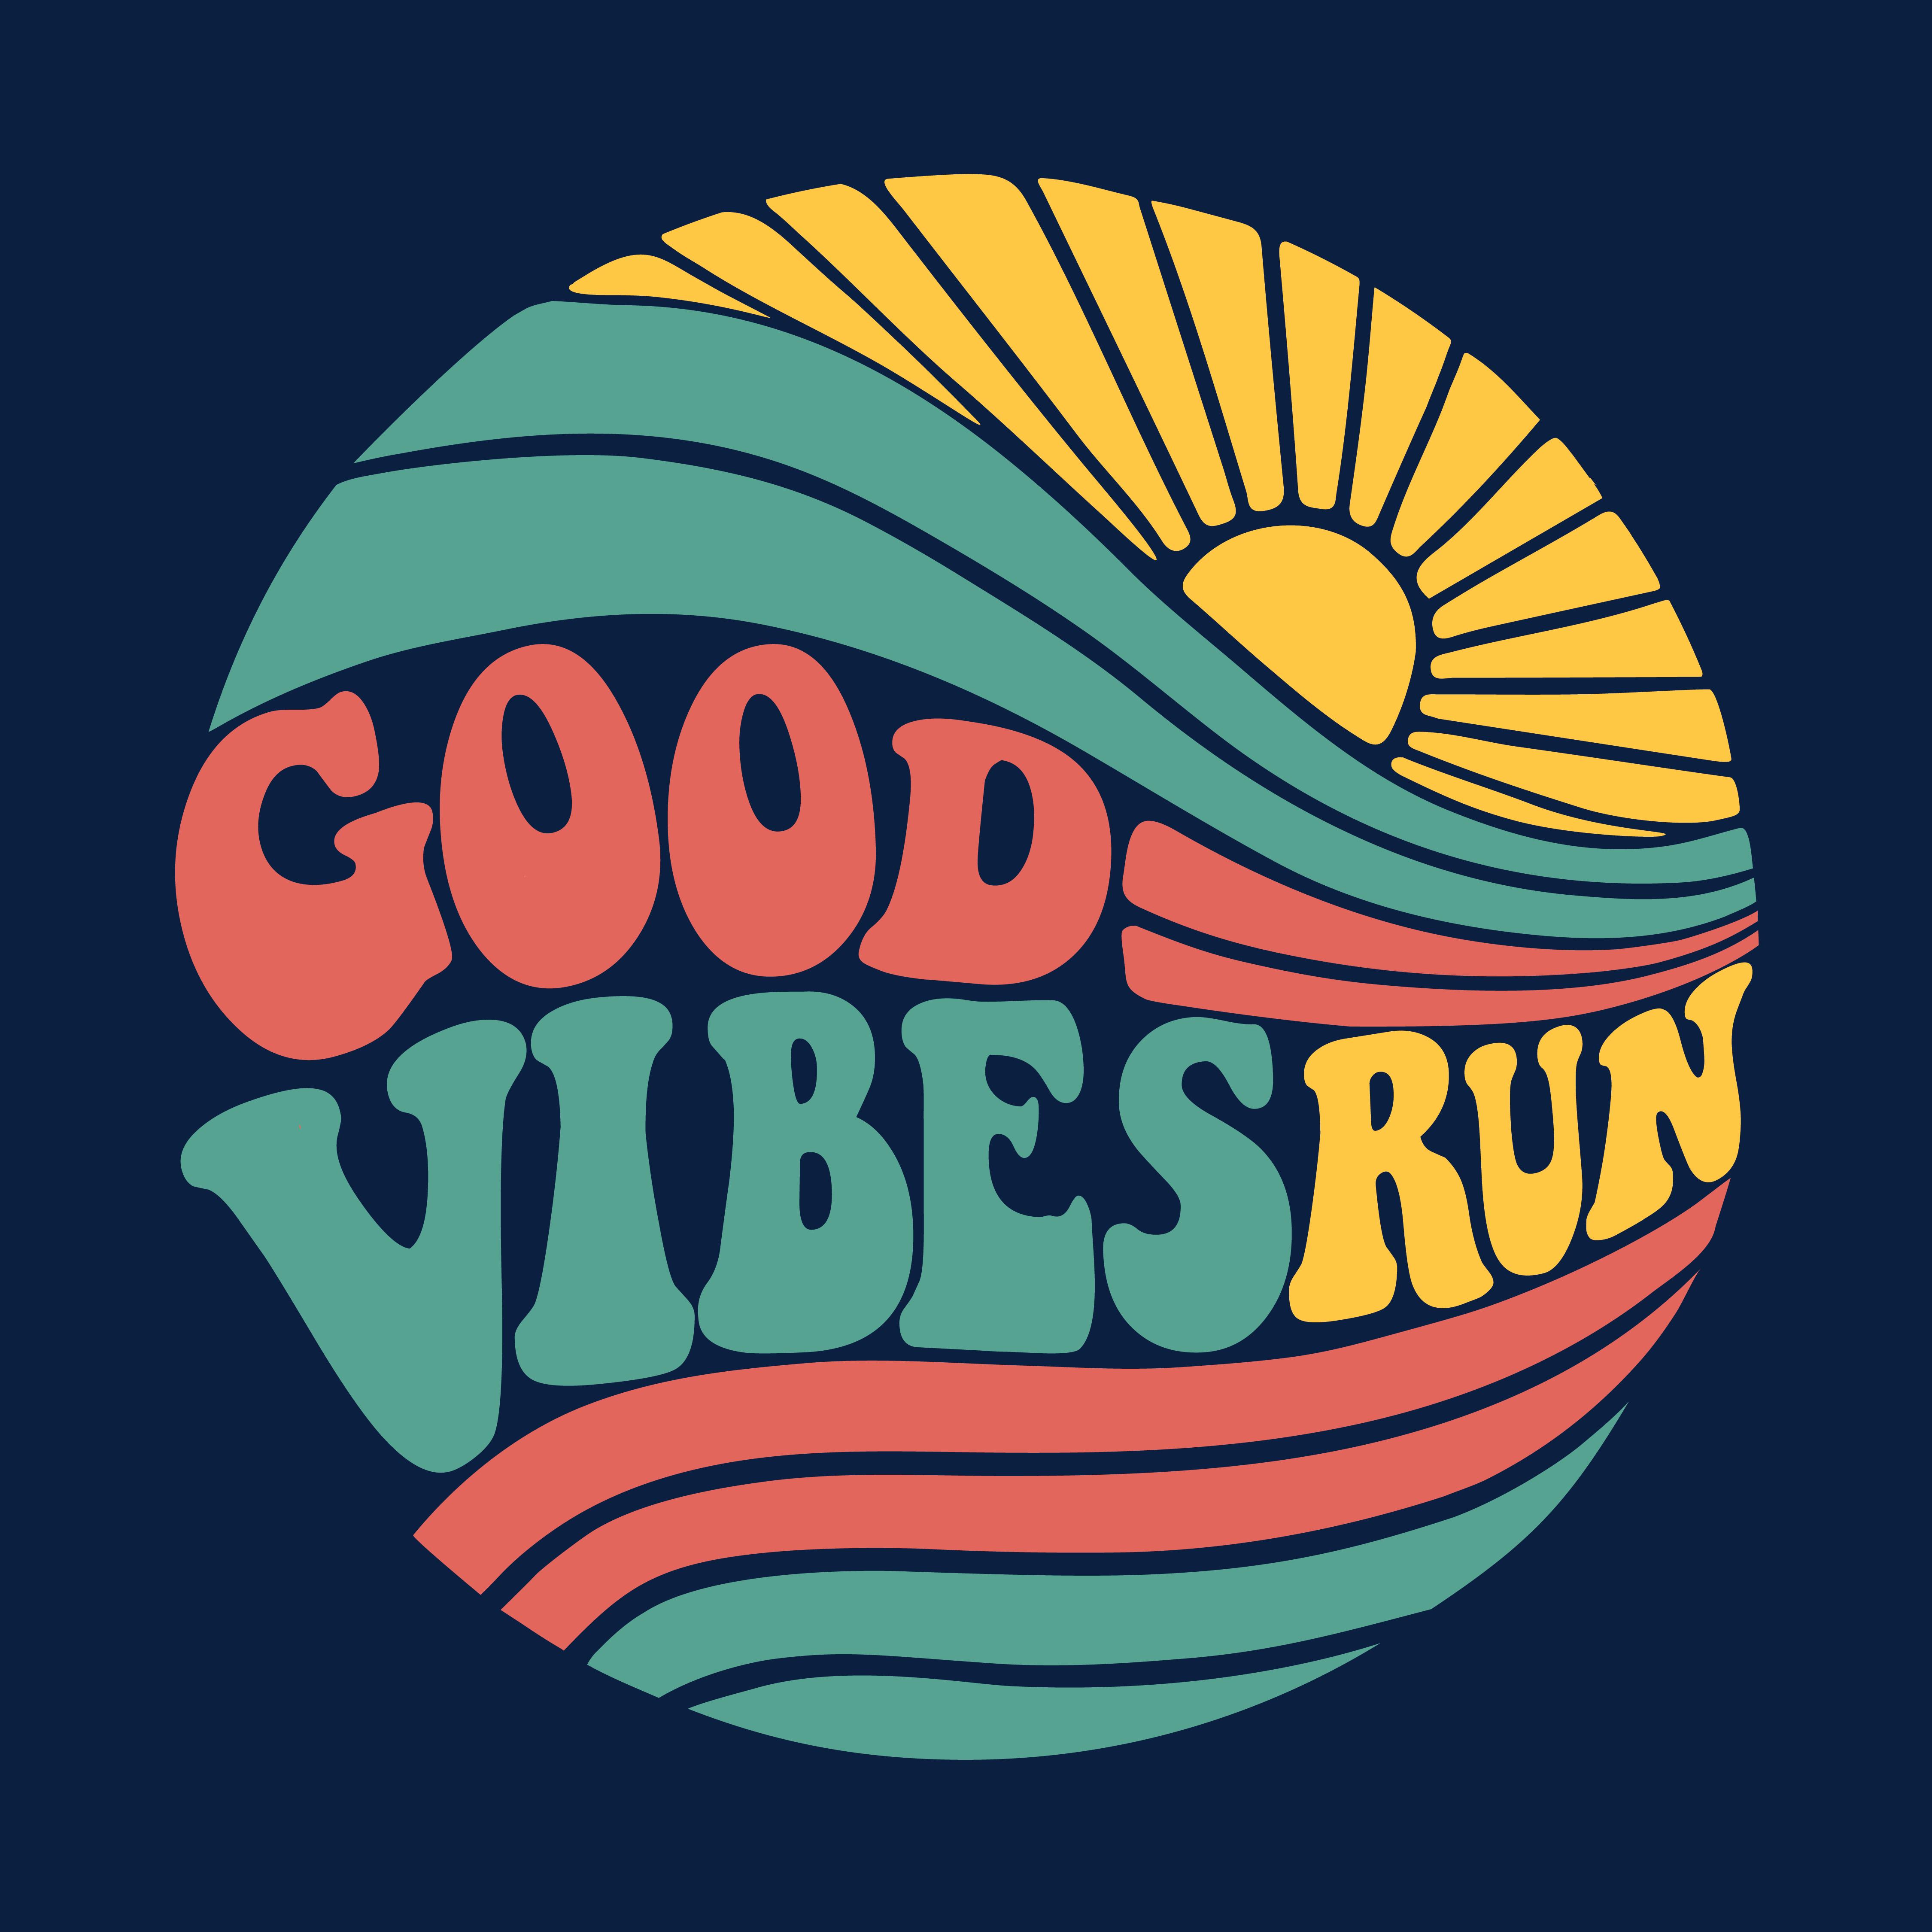 Logo of Good Vibes Run 2021